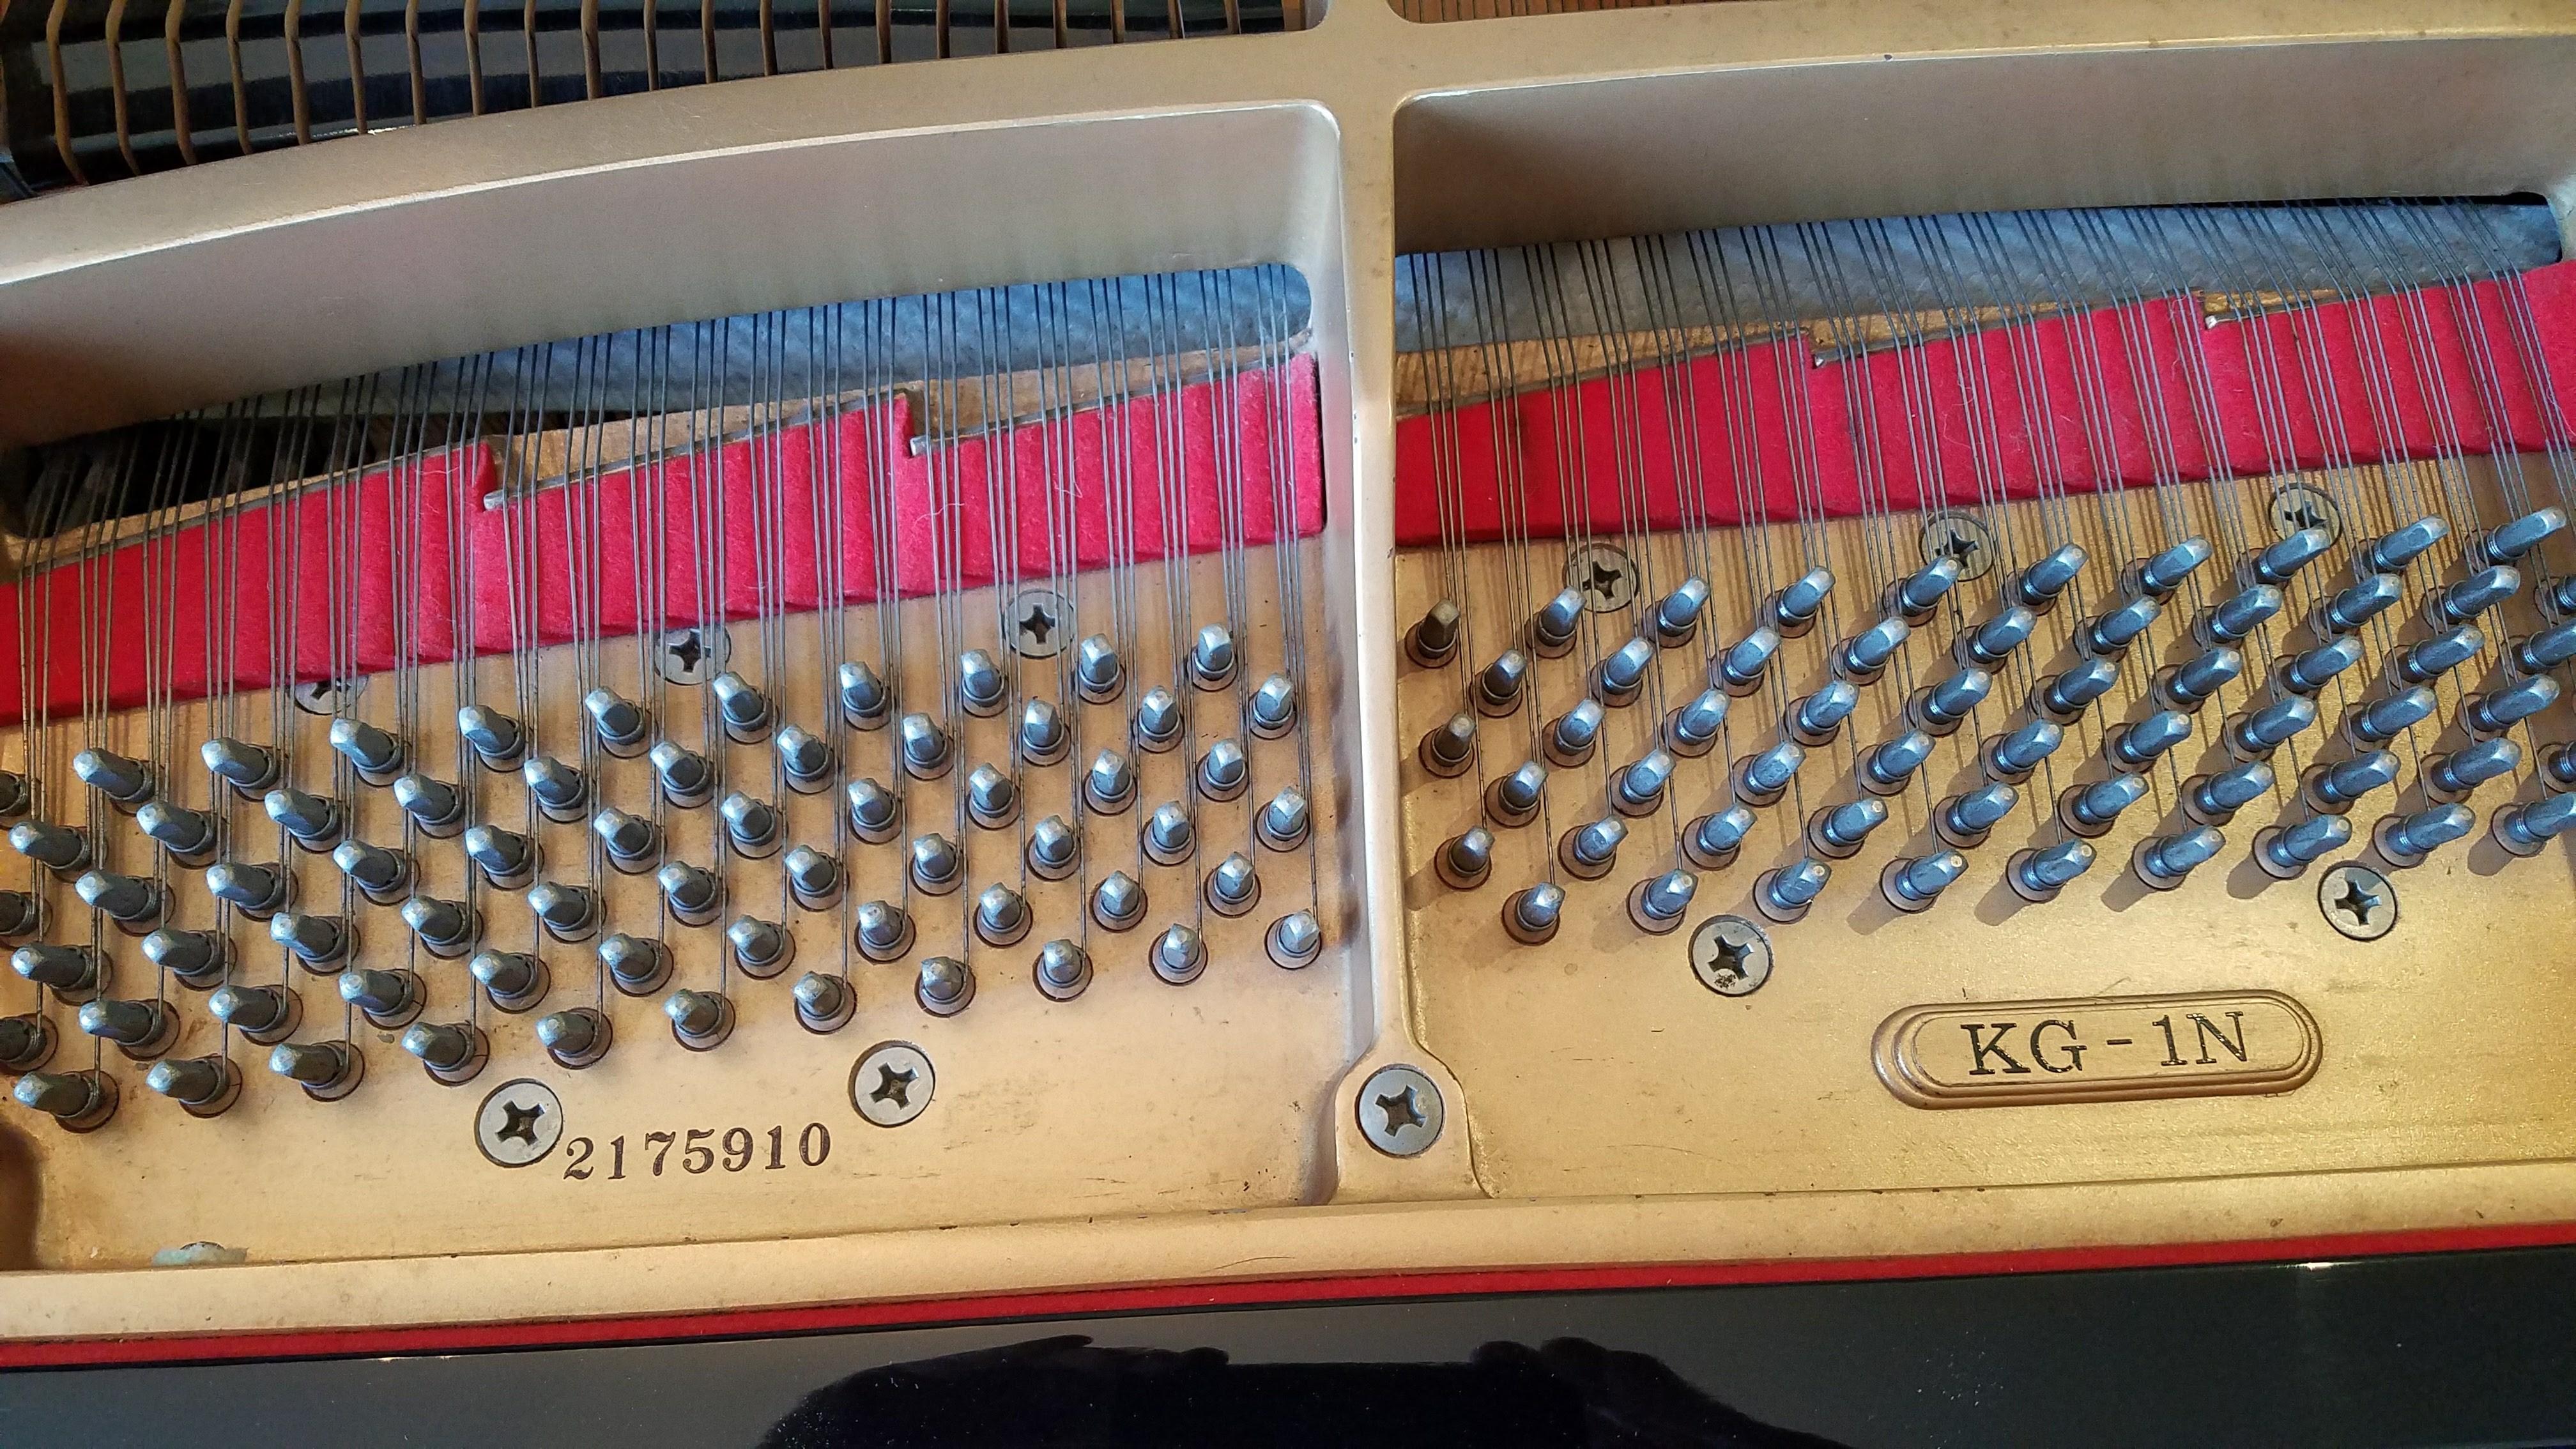 Kawai grand piano for sale